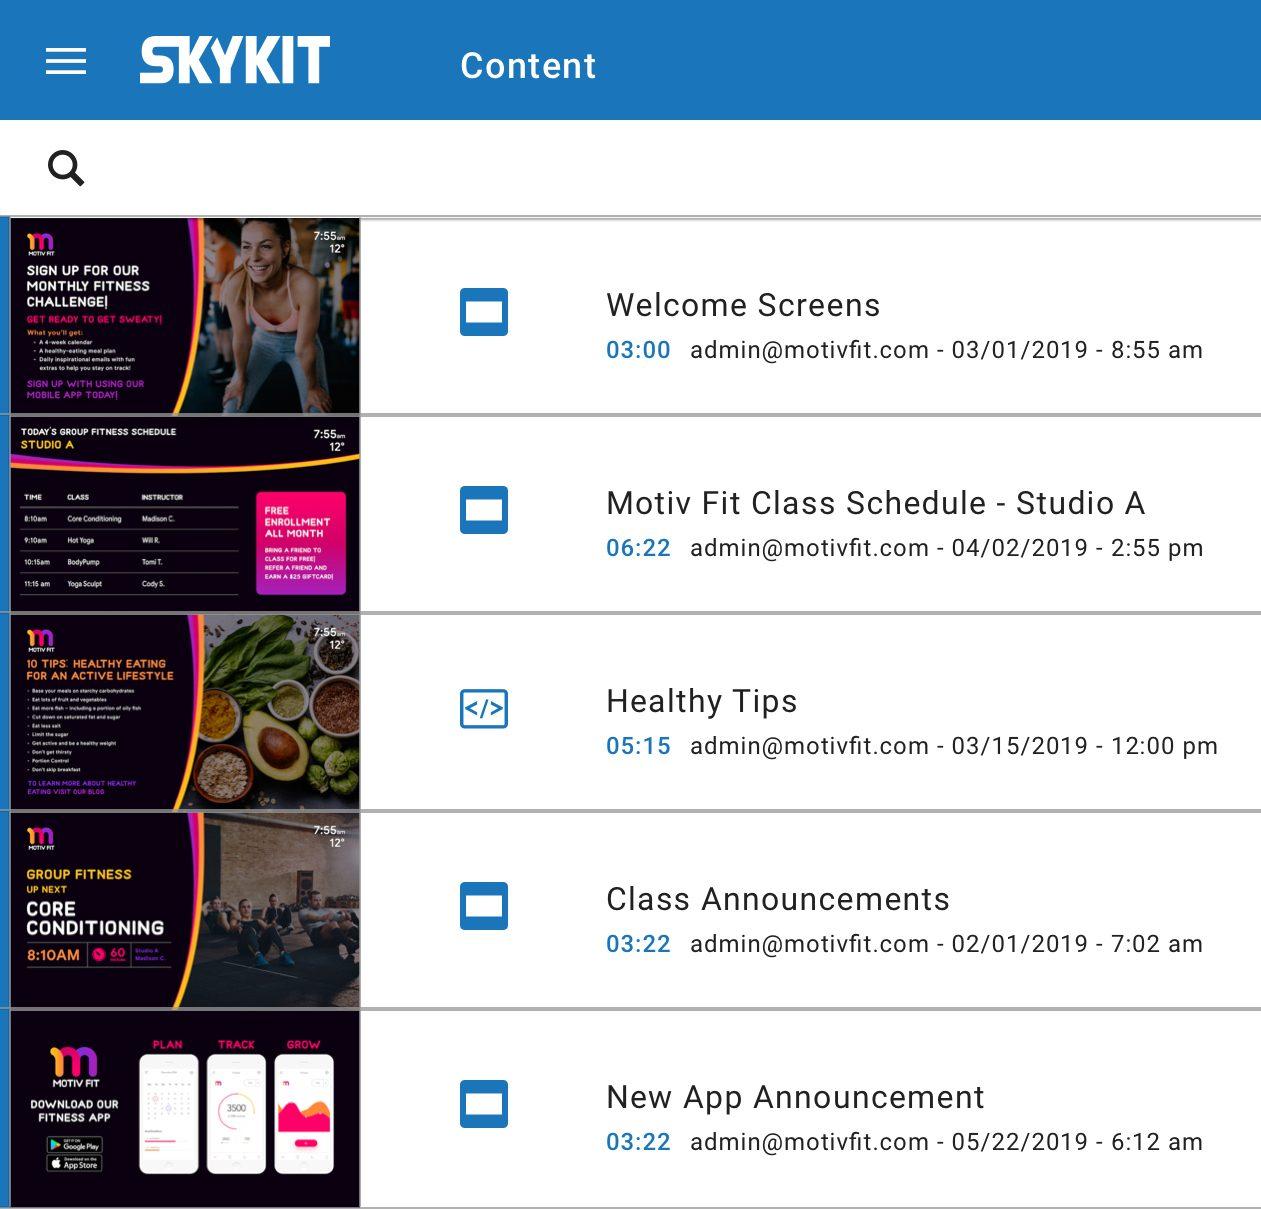 Motiv Fit powered by Skykit